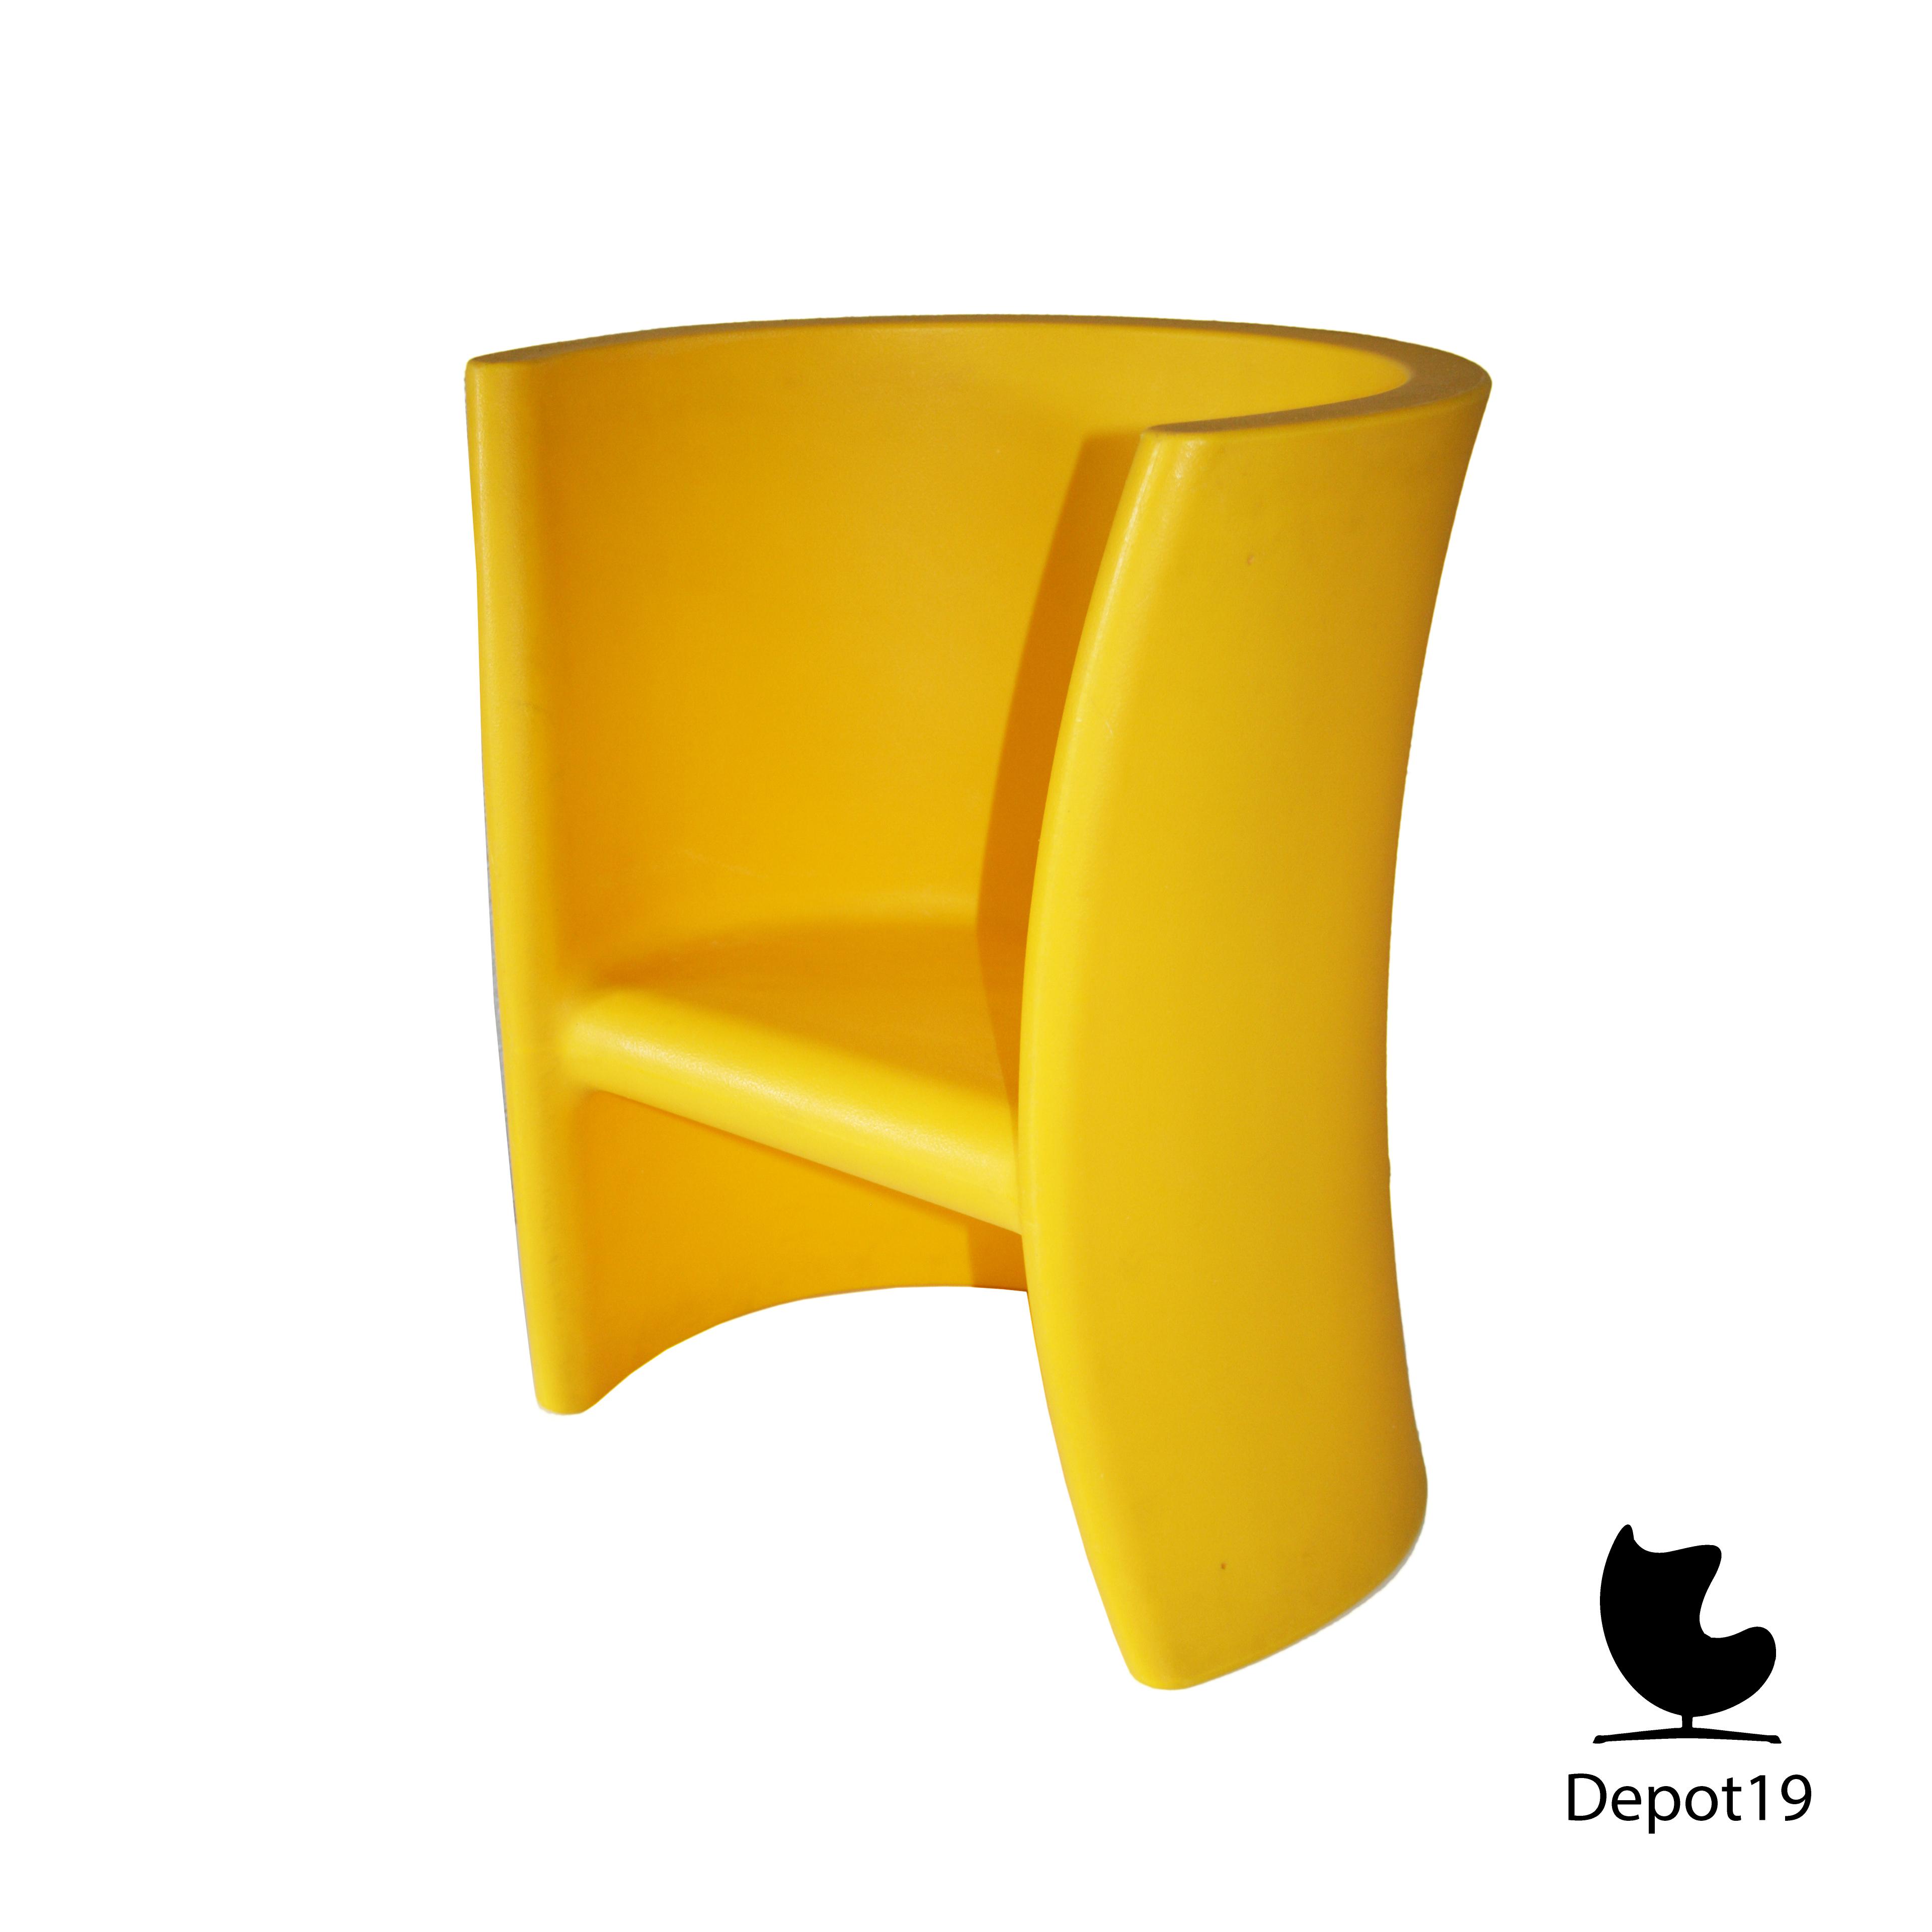 Magis Eero Aarnio Triolo Rocking Chair Depot 19